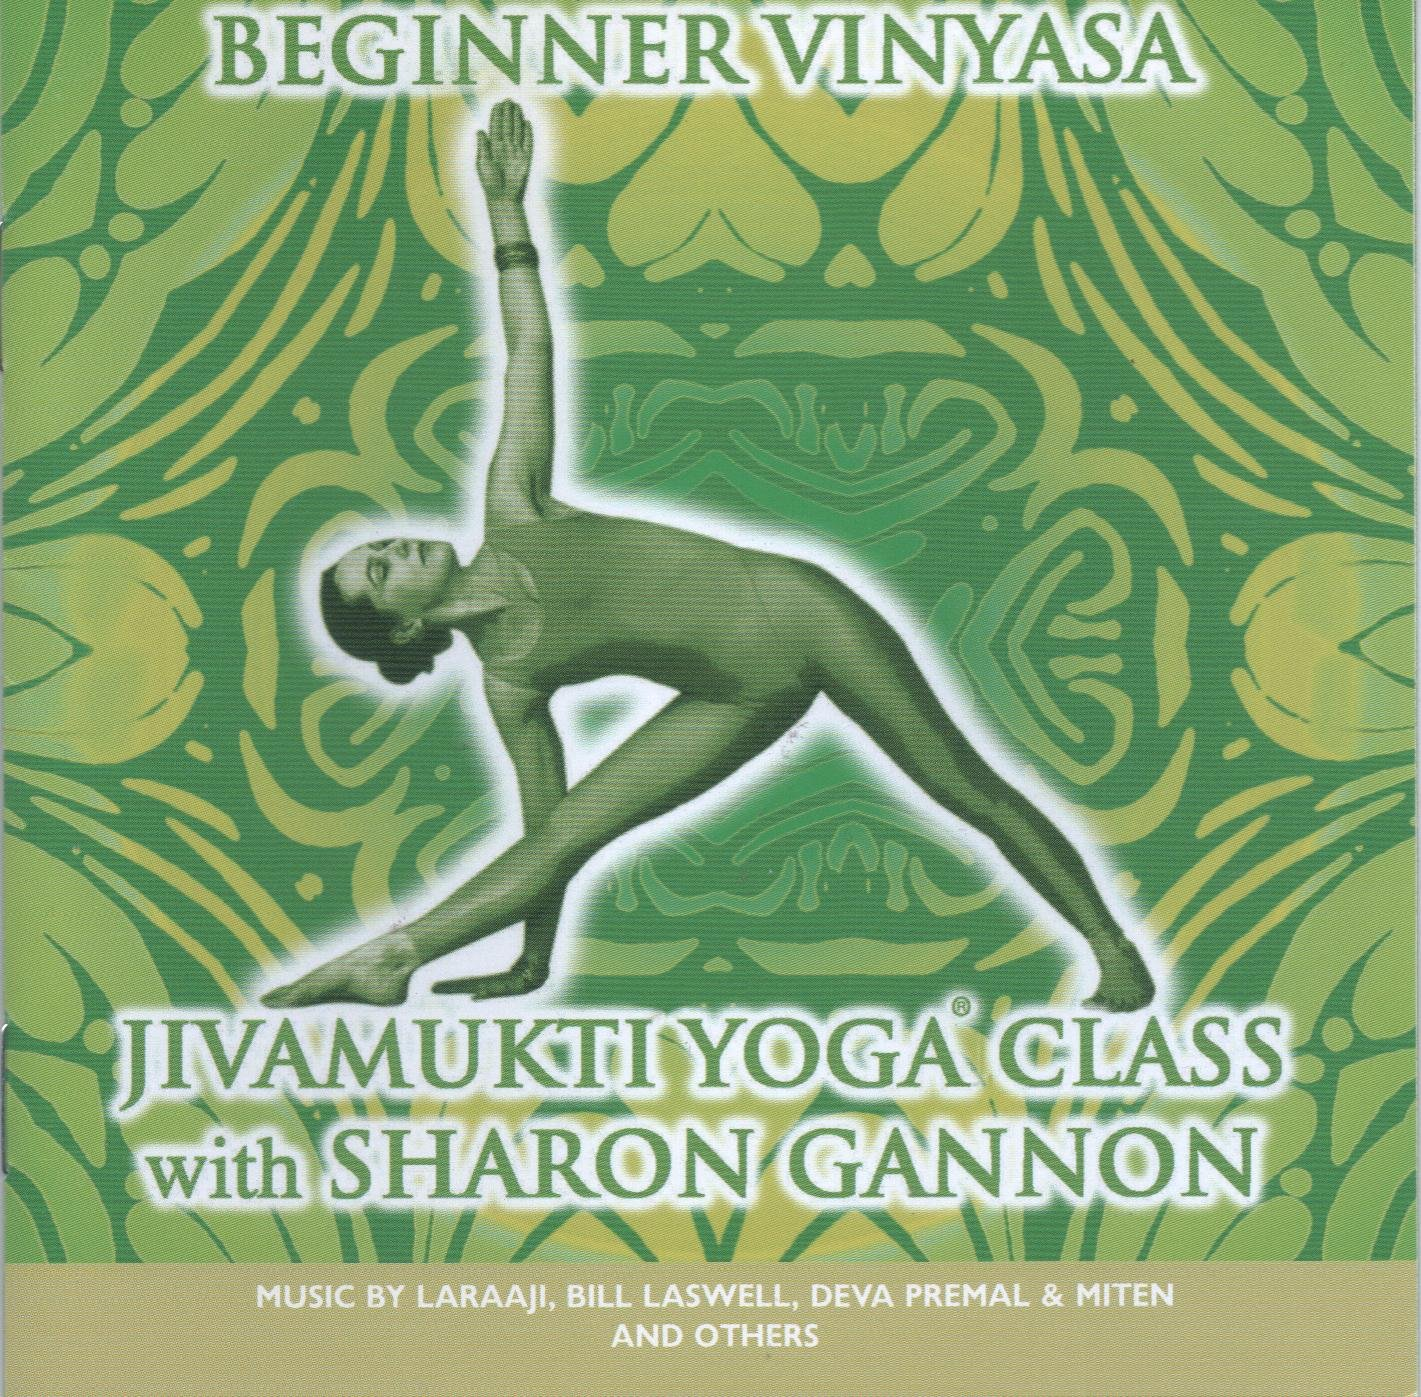 Jivamukti Yoga Class: Beginner Vinyasa with Sharon Gannon ...